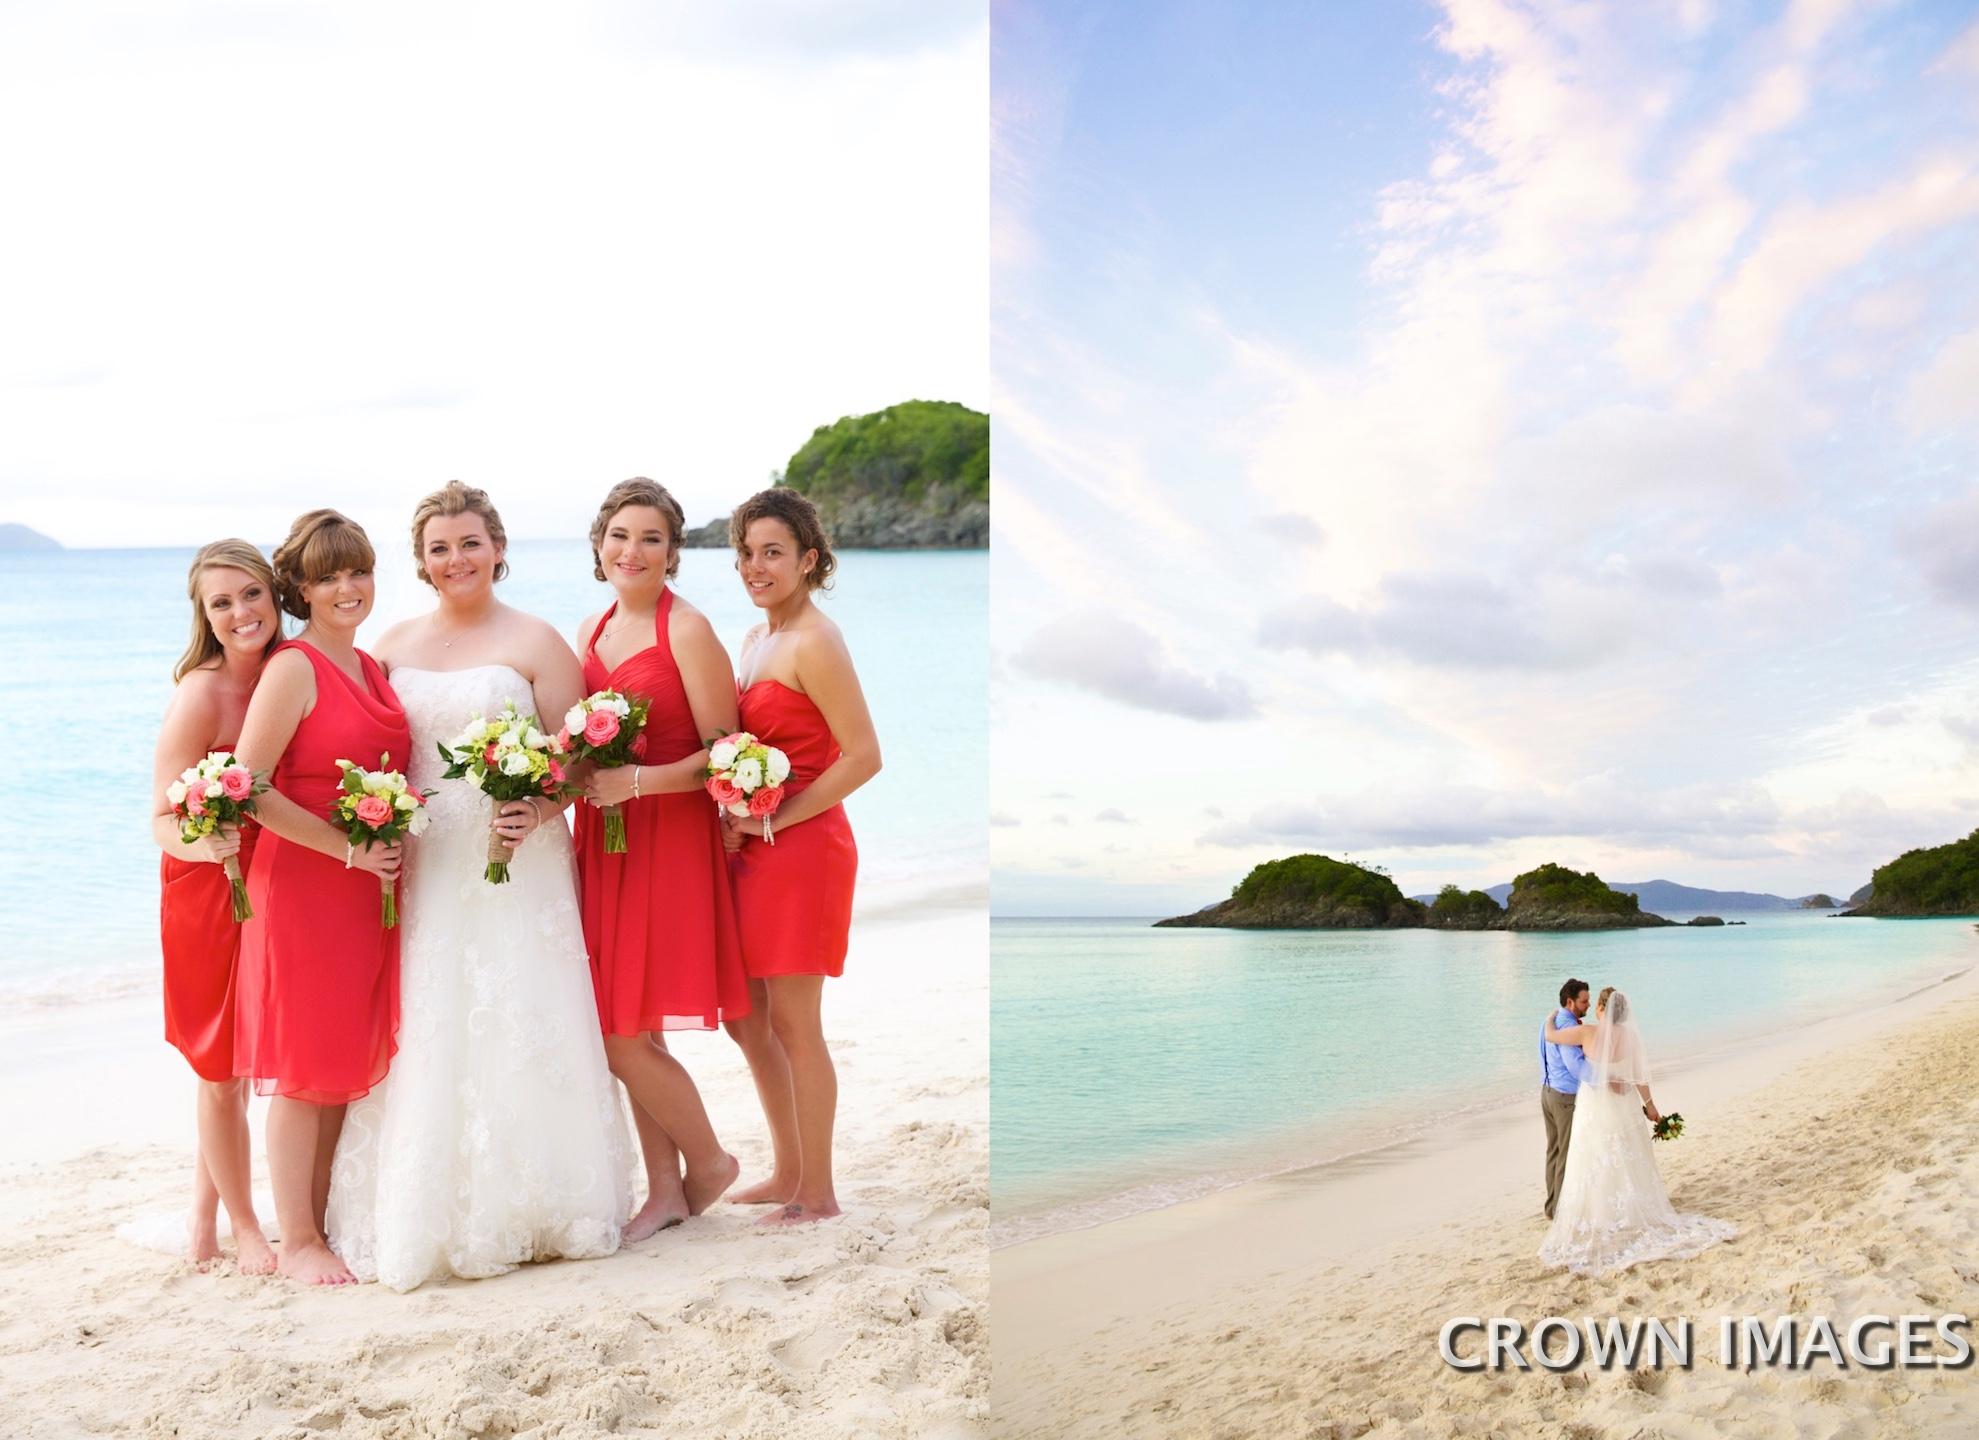 getting married in the virgin islands